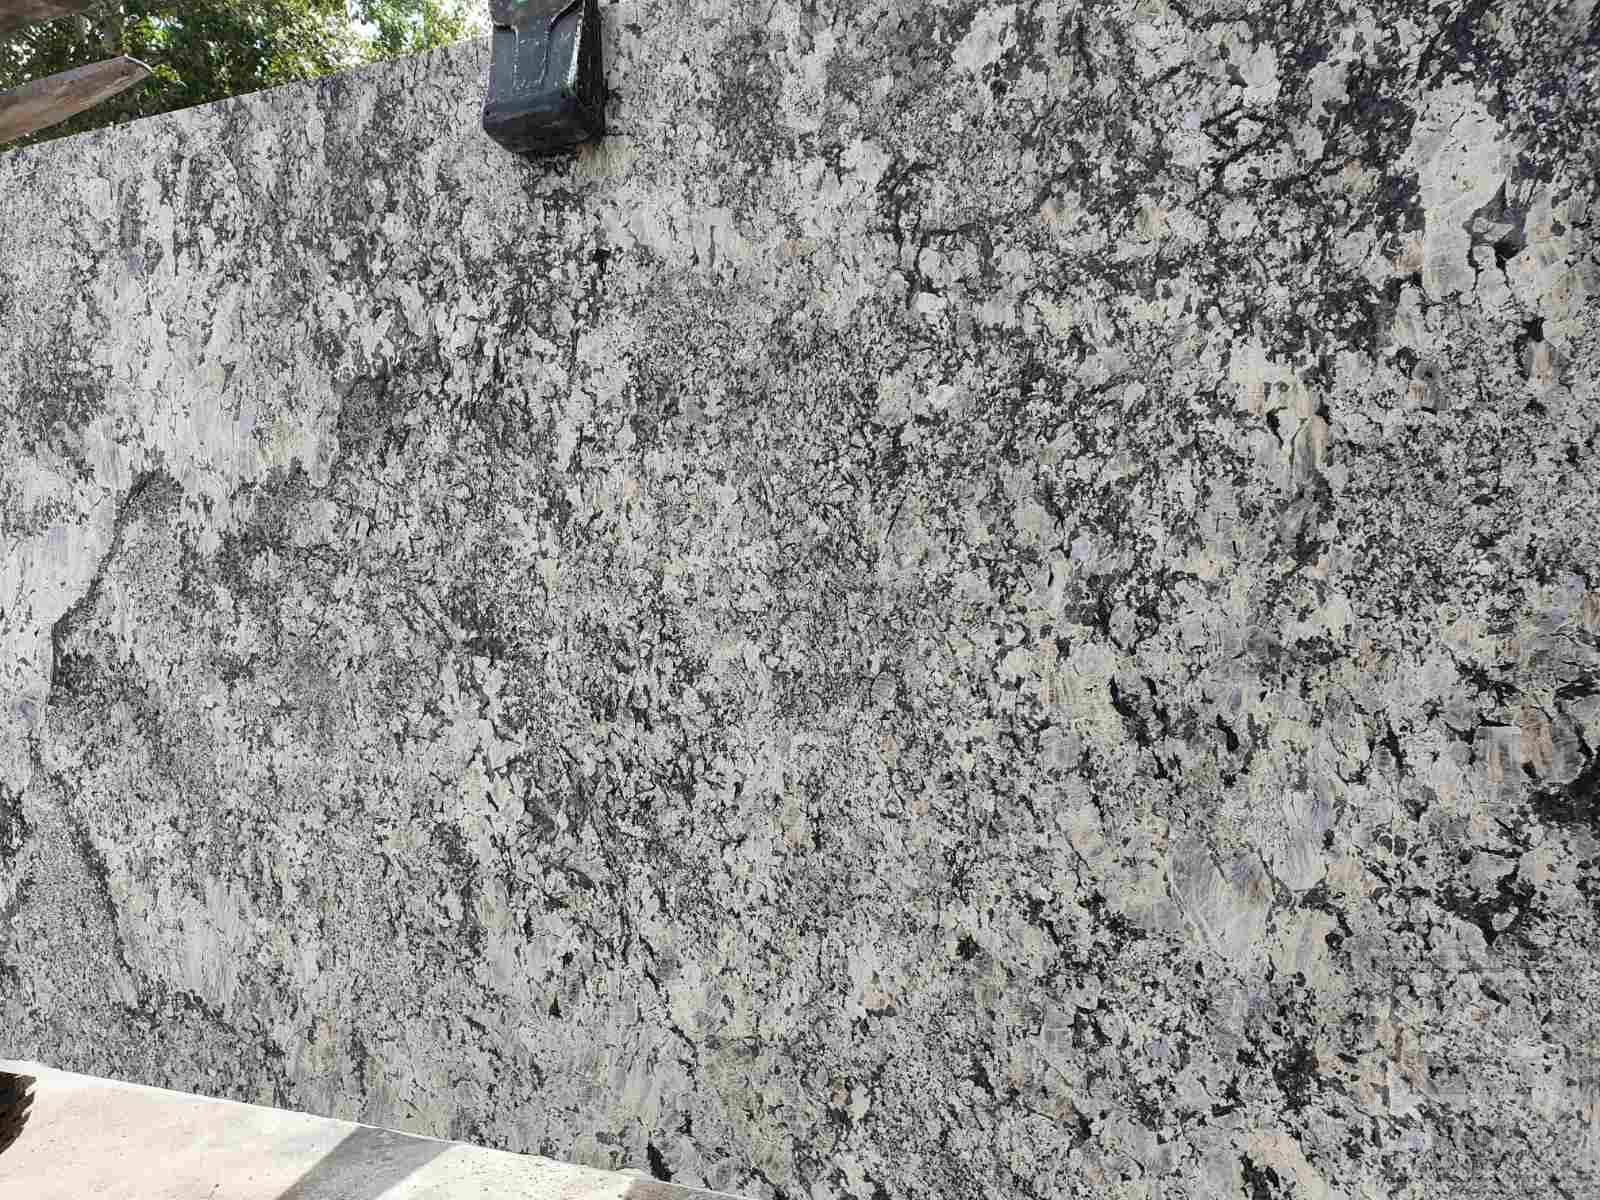 Quarzite Brescia Imperiale (20 mm) natural-quartzite - Kvartsit Brescia Imperiale V